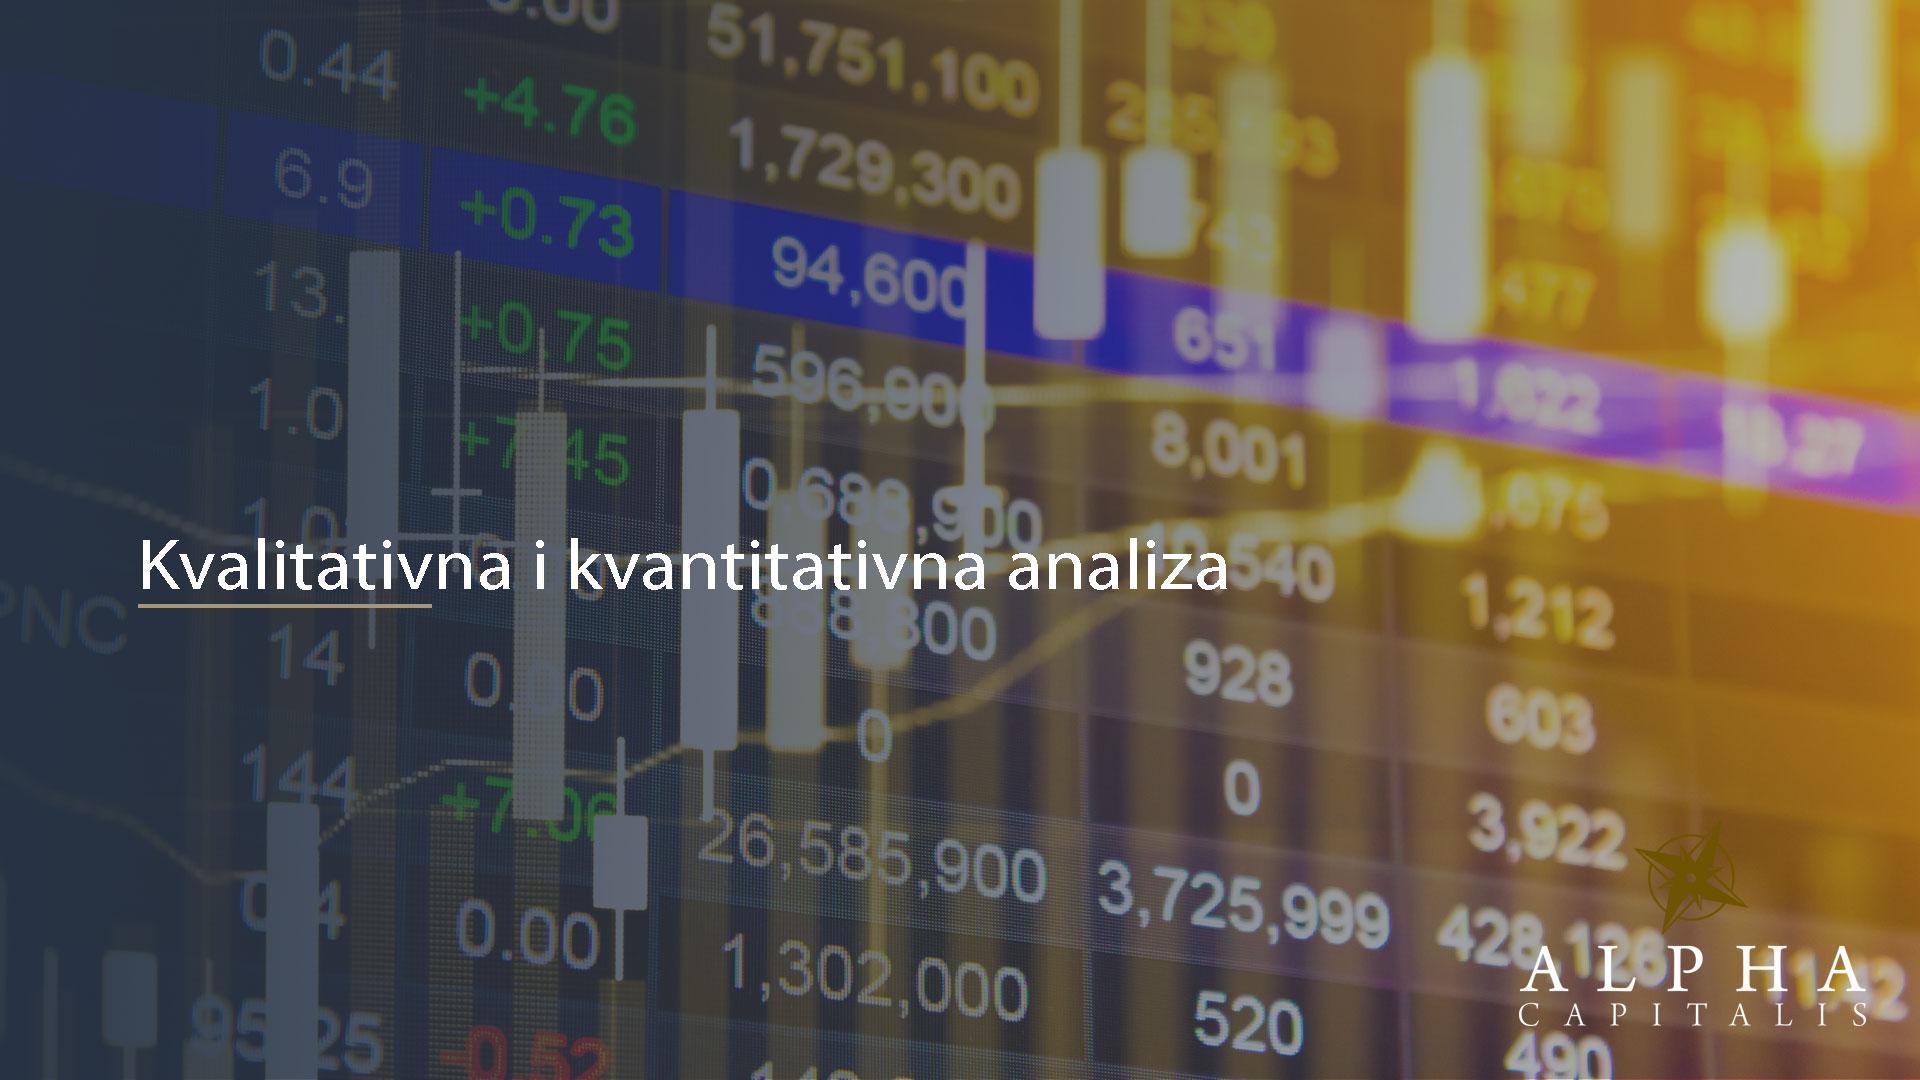 alphacapitalis_blog-Kvalitativna-analiza